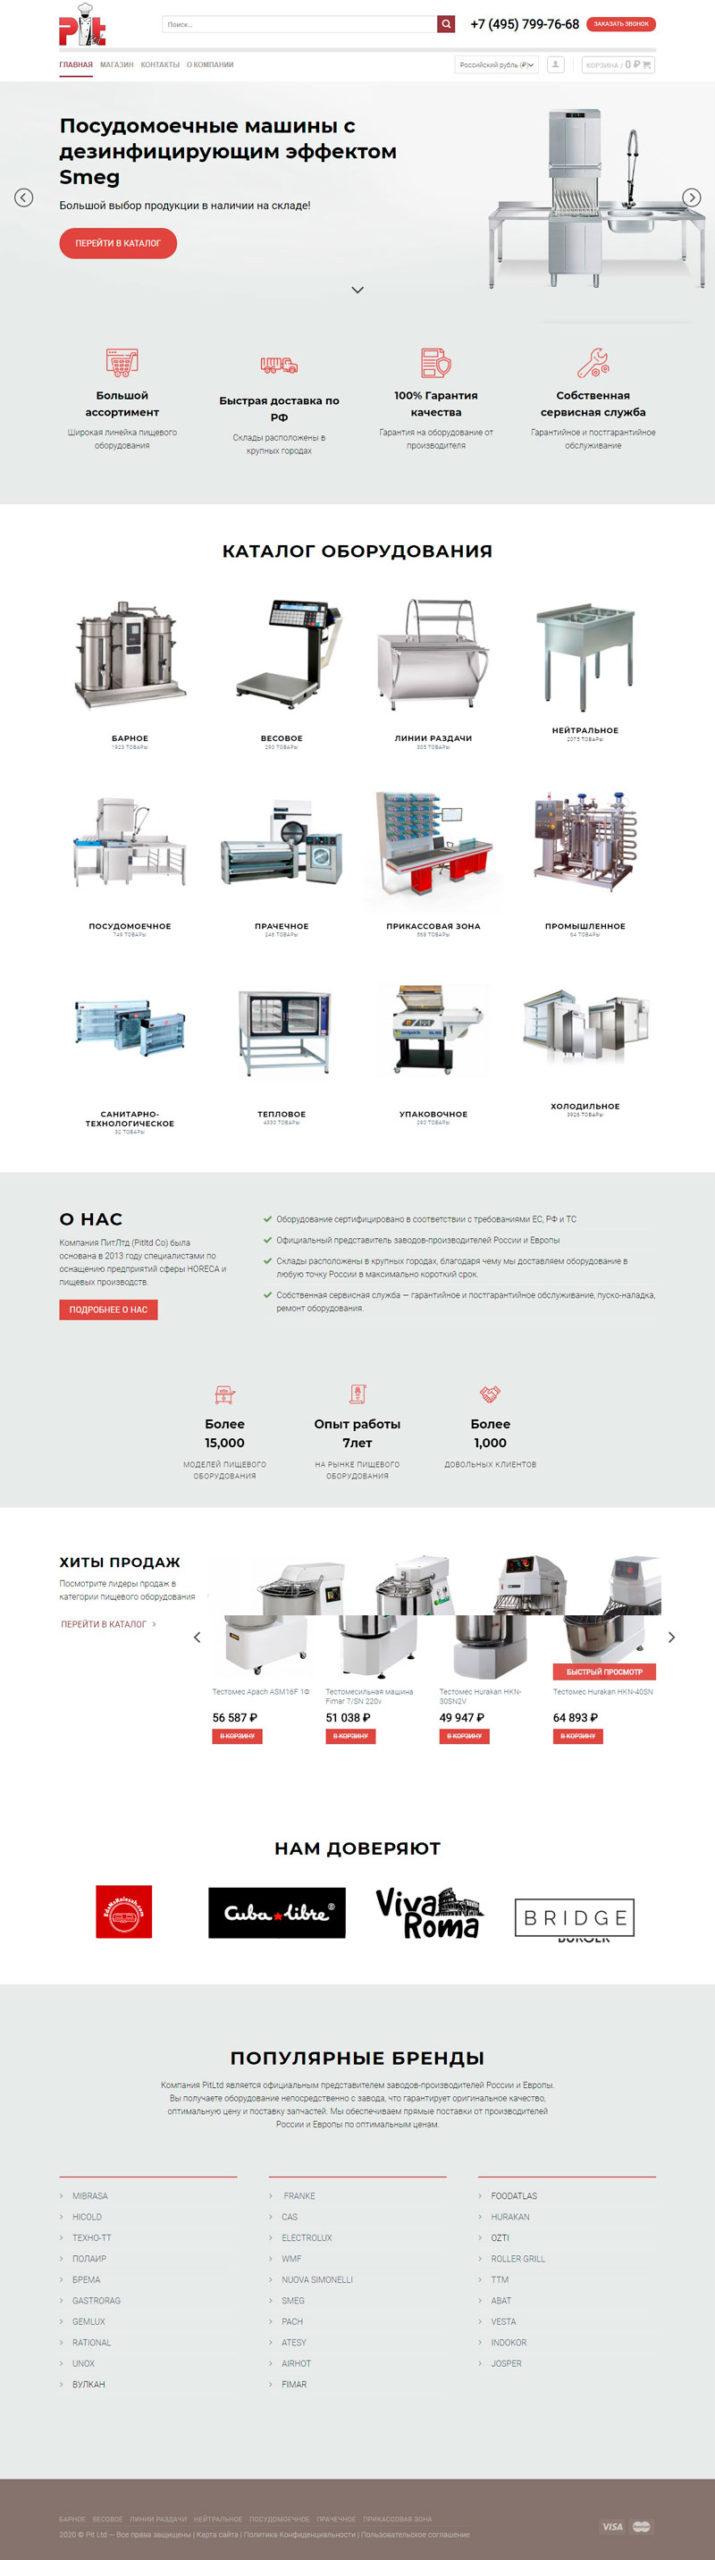 pitmarket-главная страница после редизайна